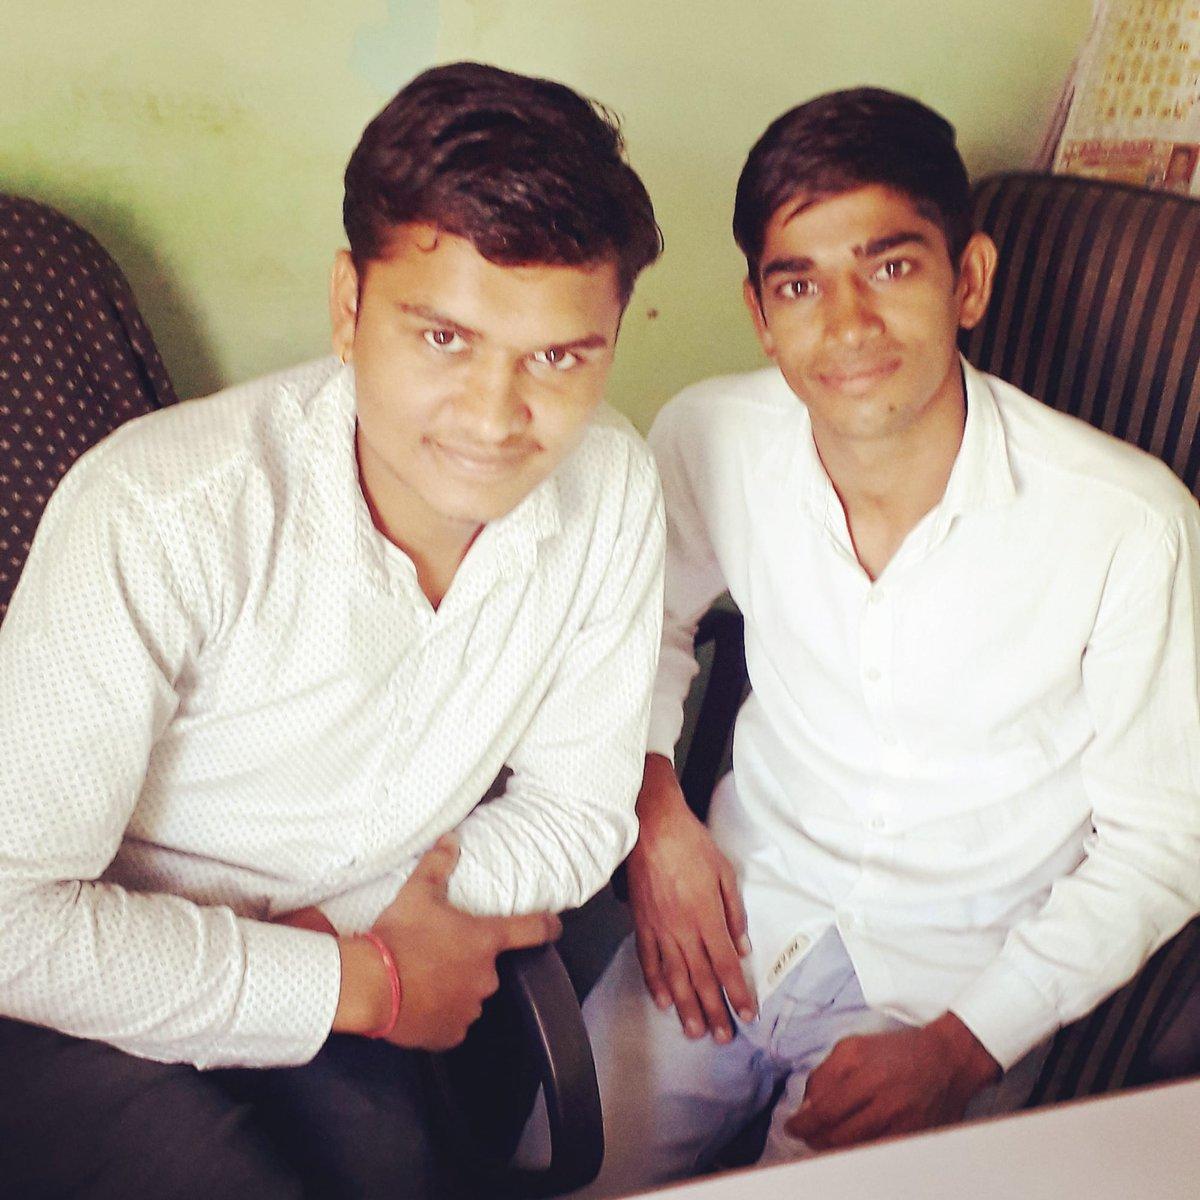 अजीज मित्र भाई #उम्मेद_गोदारा को जन्मदिवस की हार्दिक बधाई एवं शुभकामनाएँ ।। #Happy_birthday @ummedaram_beniwal #congretulations #birthday #Bhai_Ji @MadanSarunda @AbhimanyuP00NIA @MkjaatINC @realshooterdadi @DUNGAR_JAAT_INC